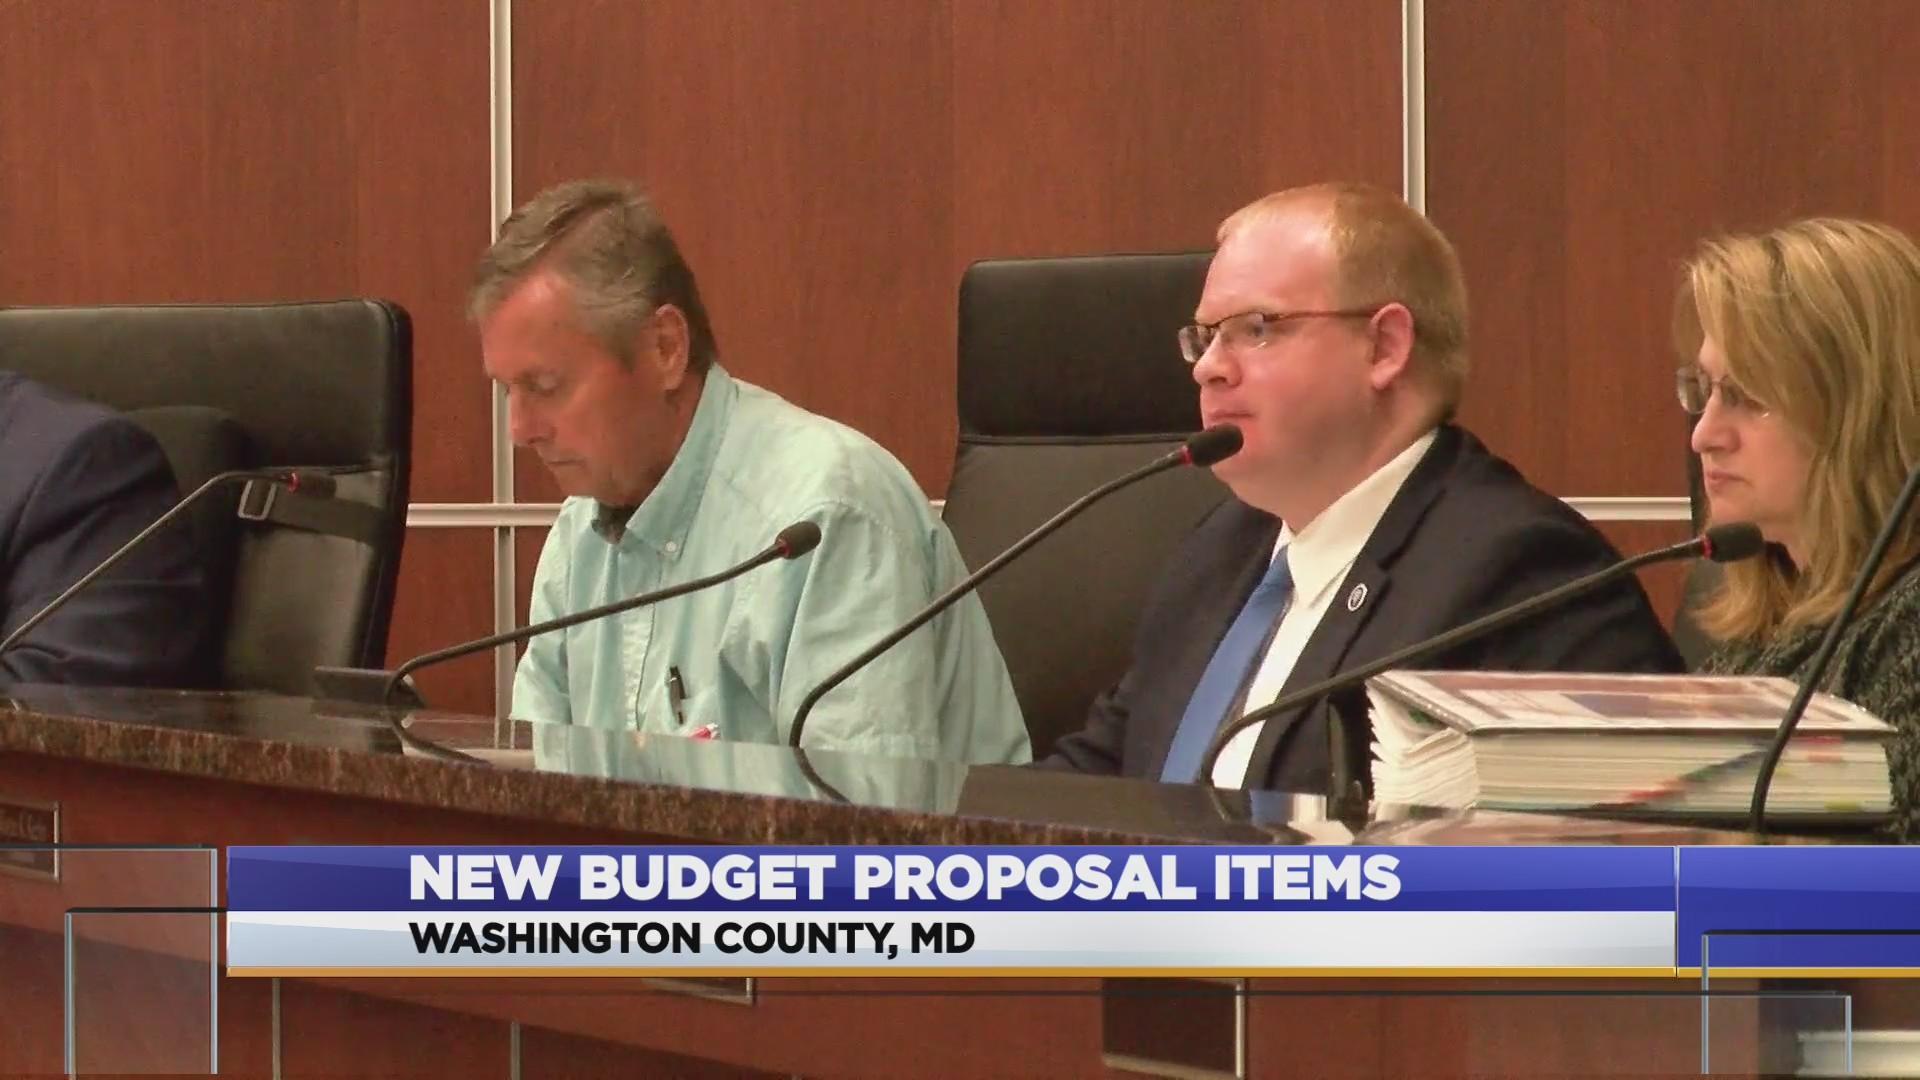 New_budget_proposal_items_Washington_Cou_0_20190529212106